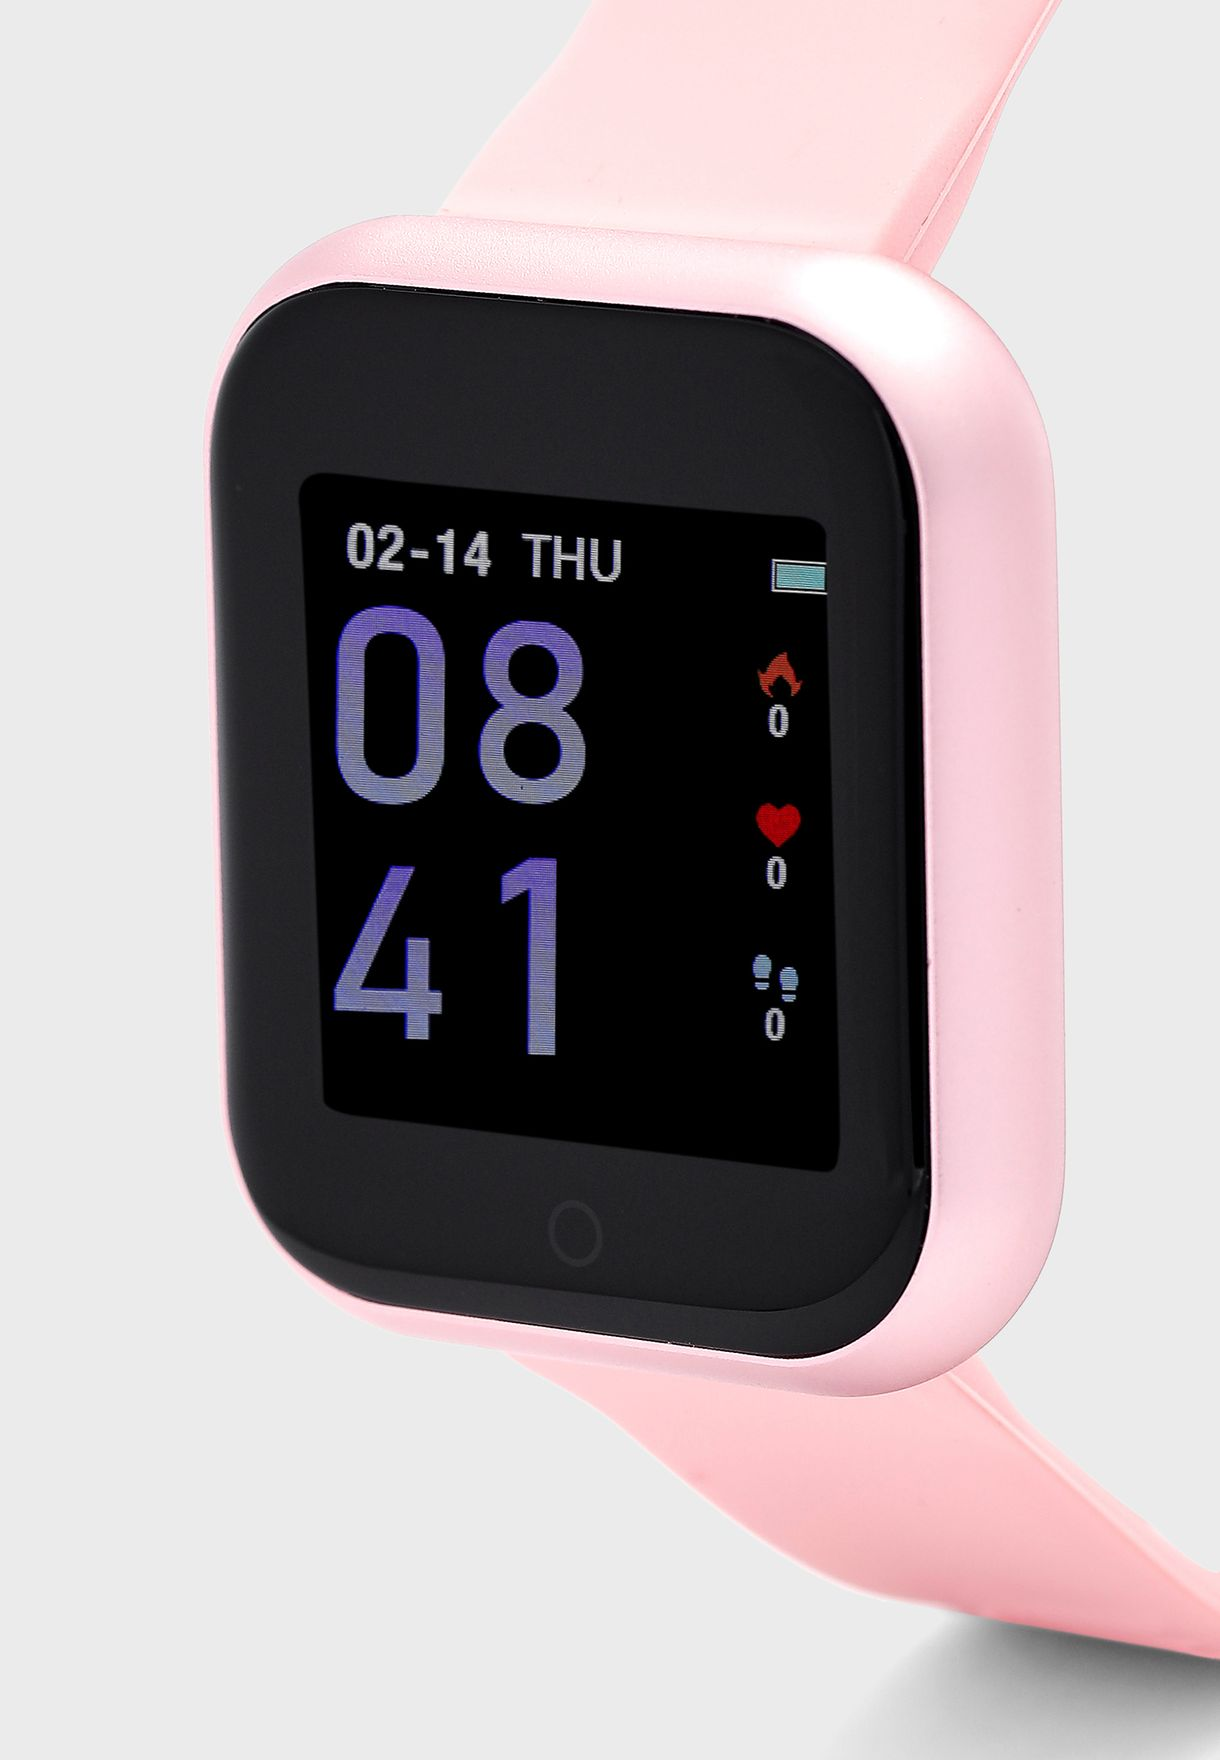 ساعة ذكية مع حزام قابل للتبديل